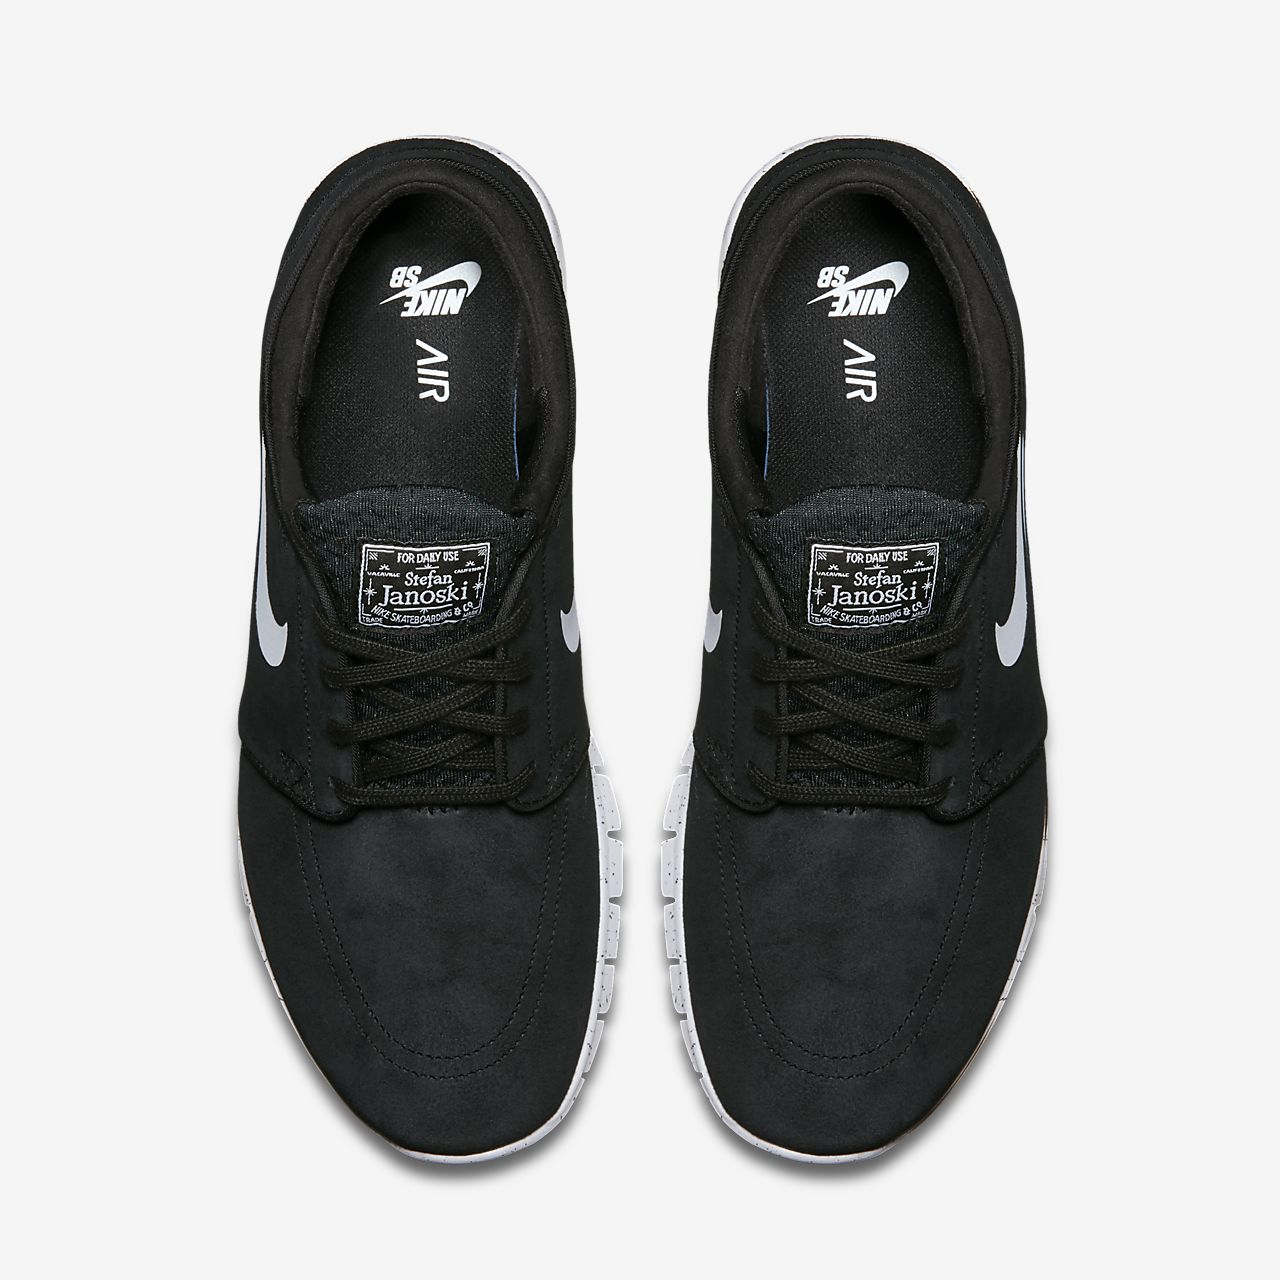 ... Nike SB Stefan Janoski Max L Men's Skateboarding Shoe